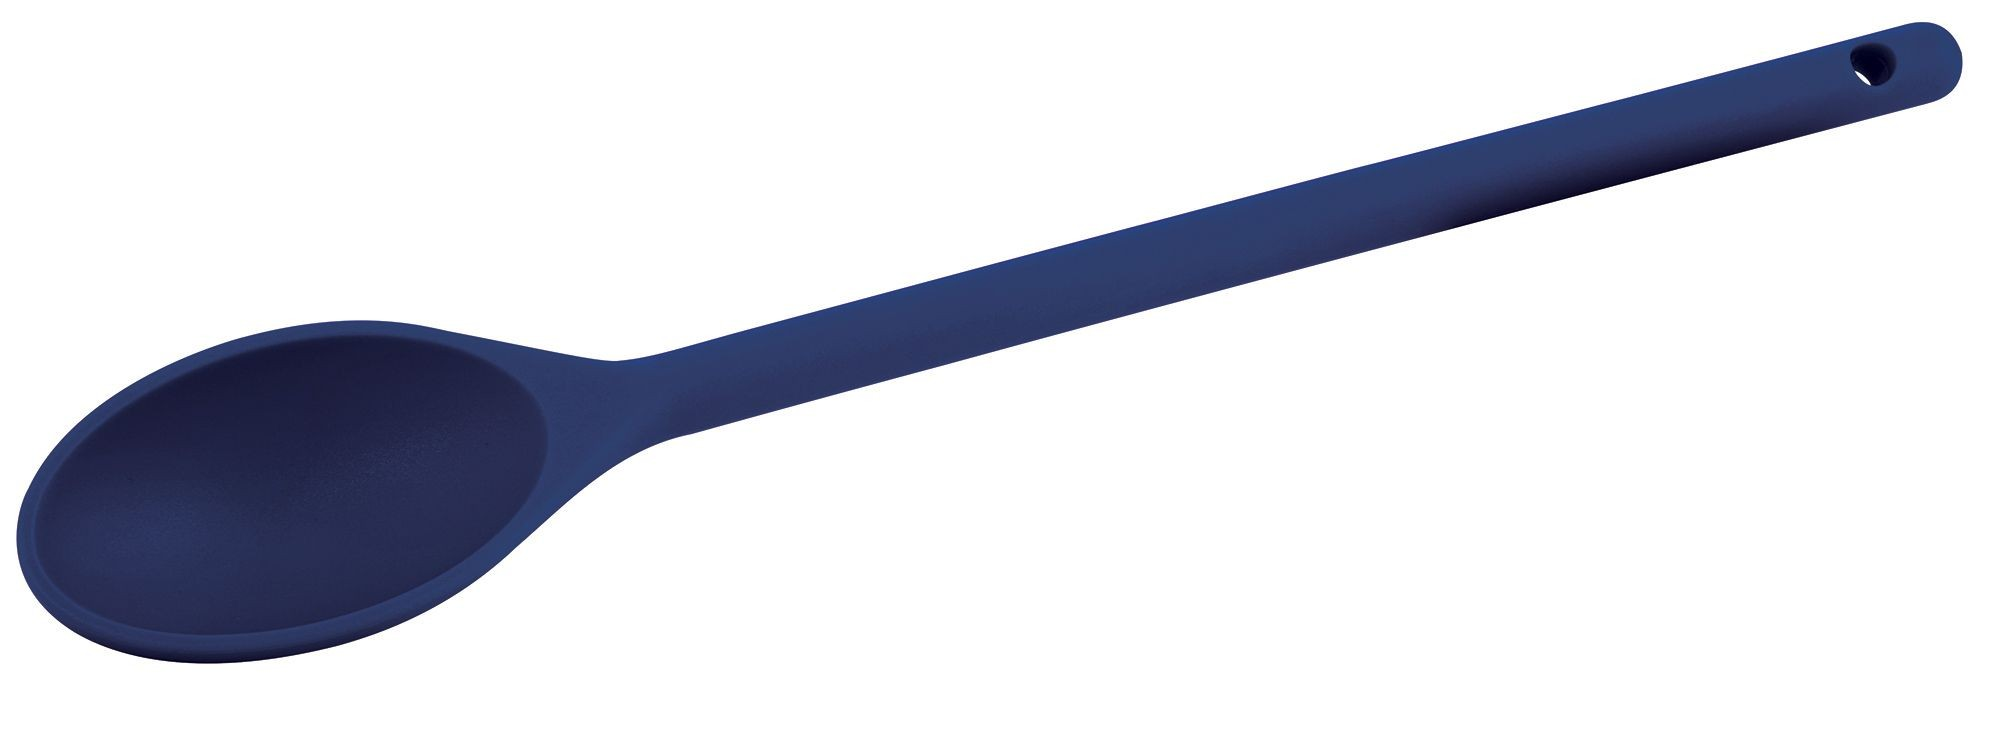 "Winco NS-15B Blue Nylon Heat Resistant Spoon, 15"""